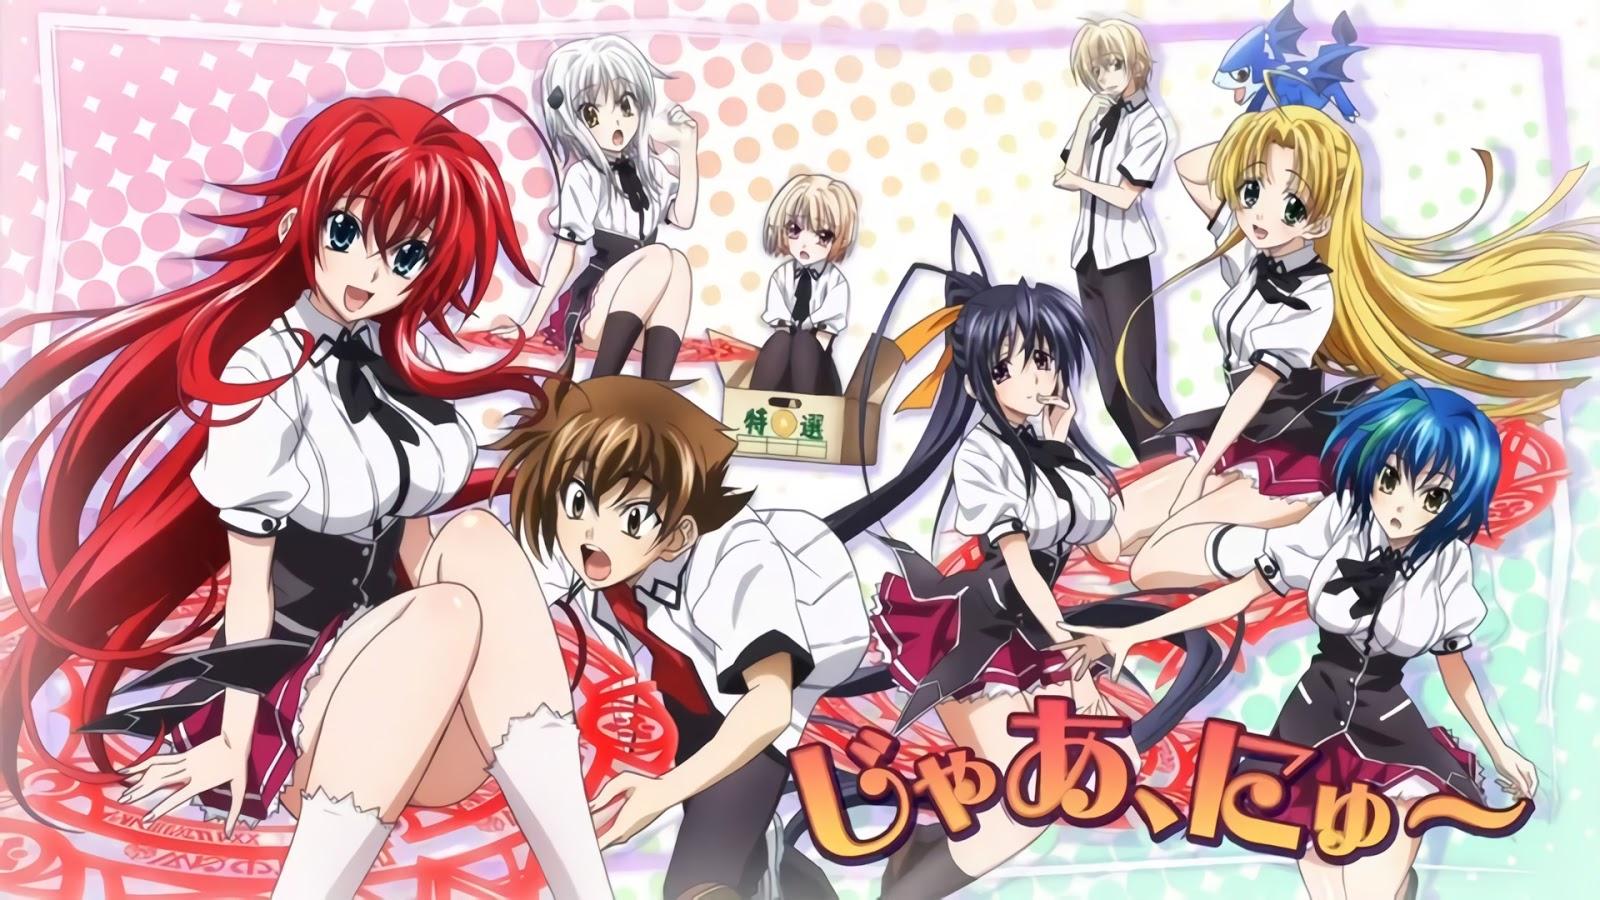 Highschool DxD New BD + OVA [S2] Subtitle Indonesia